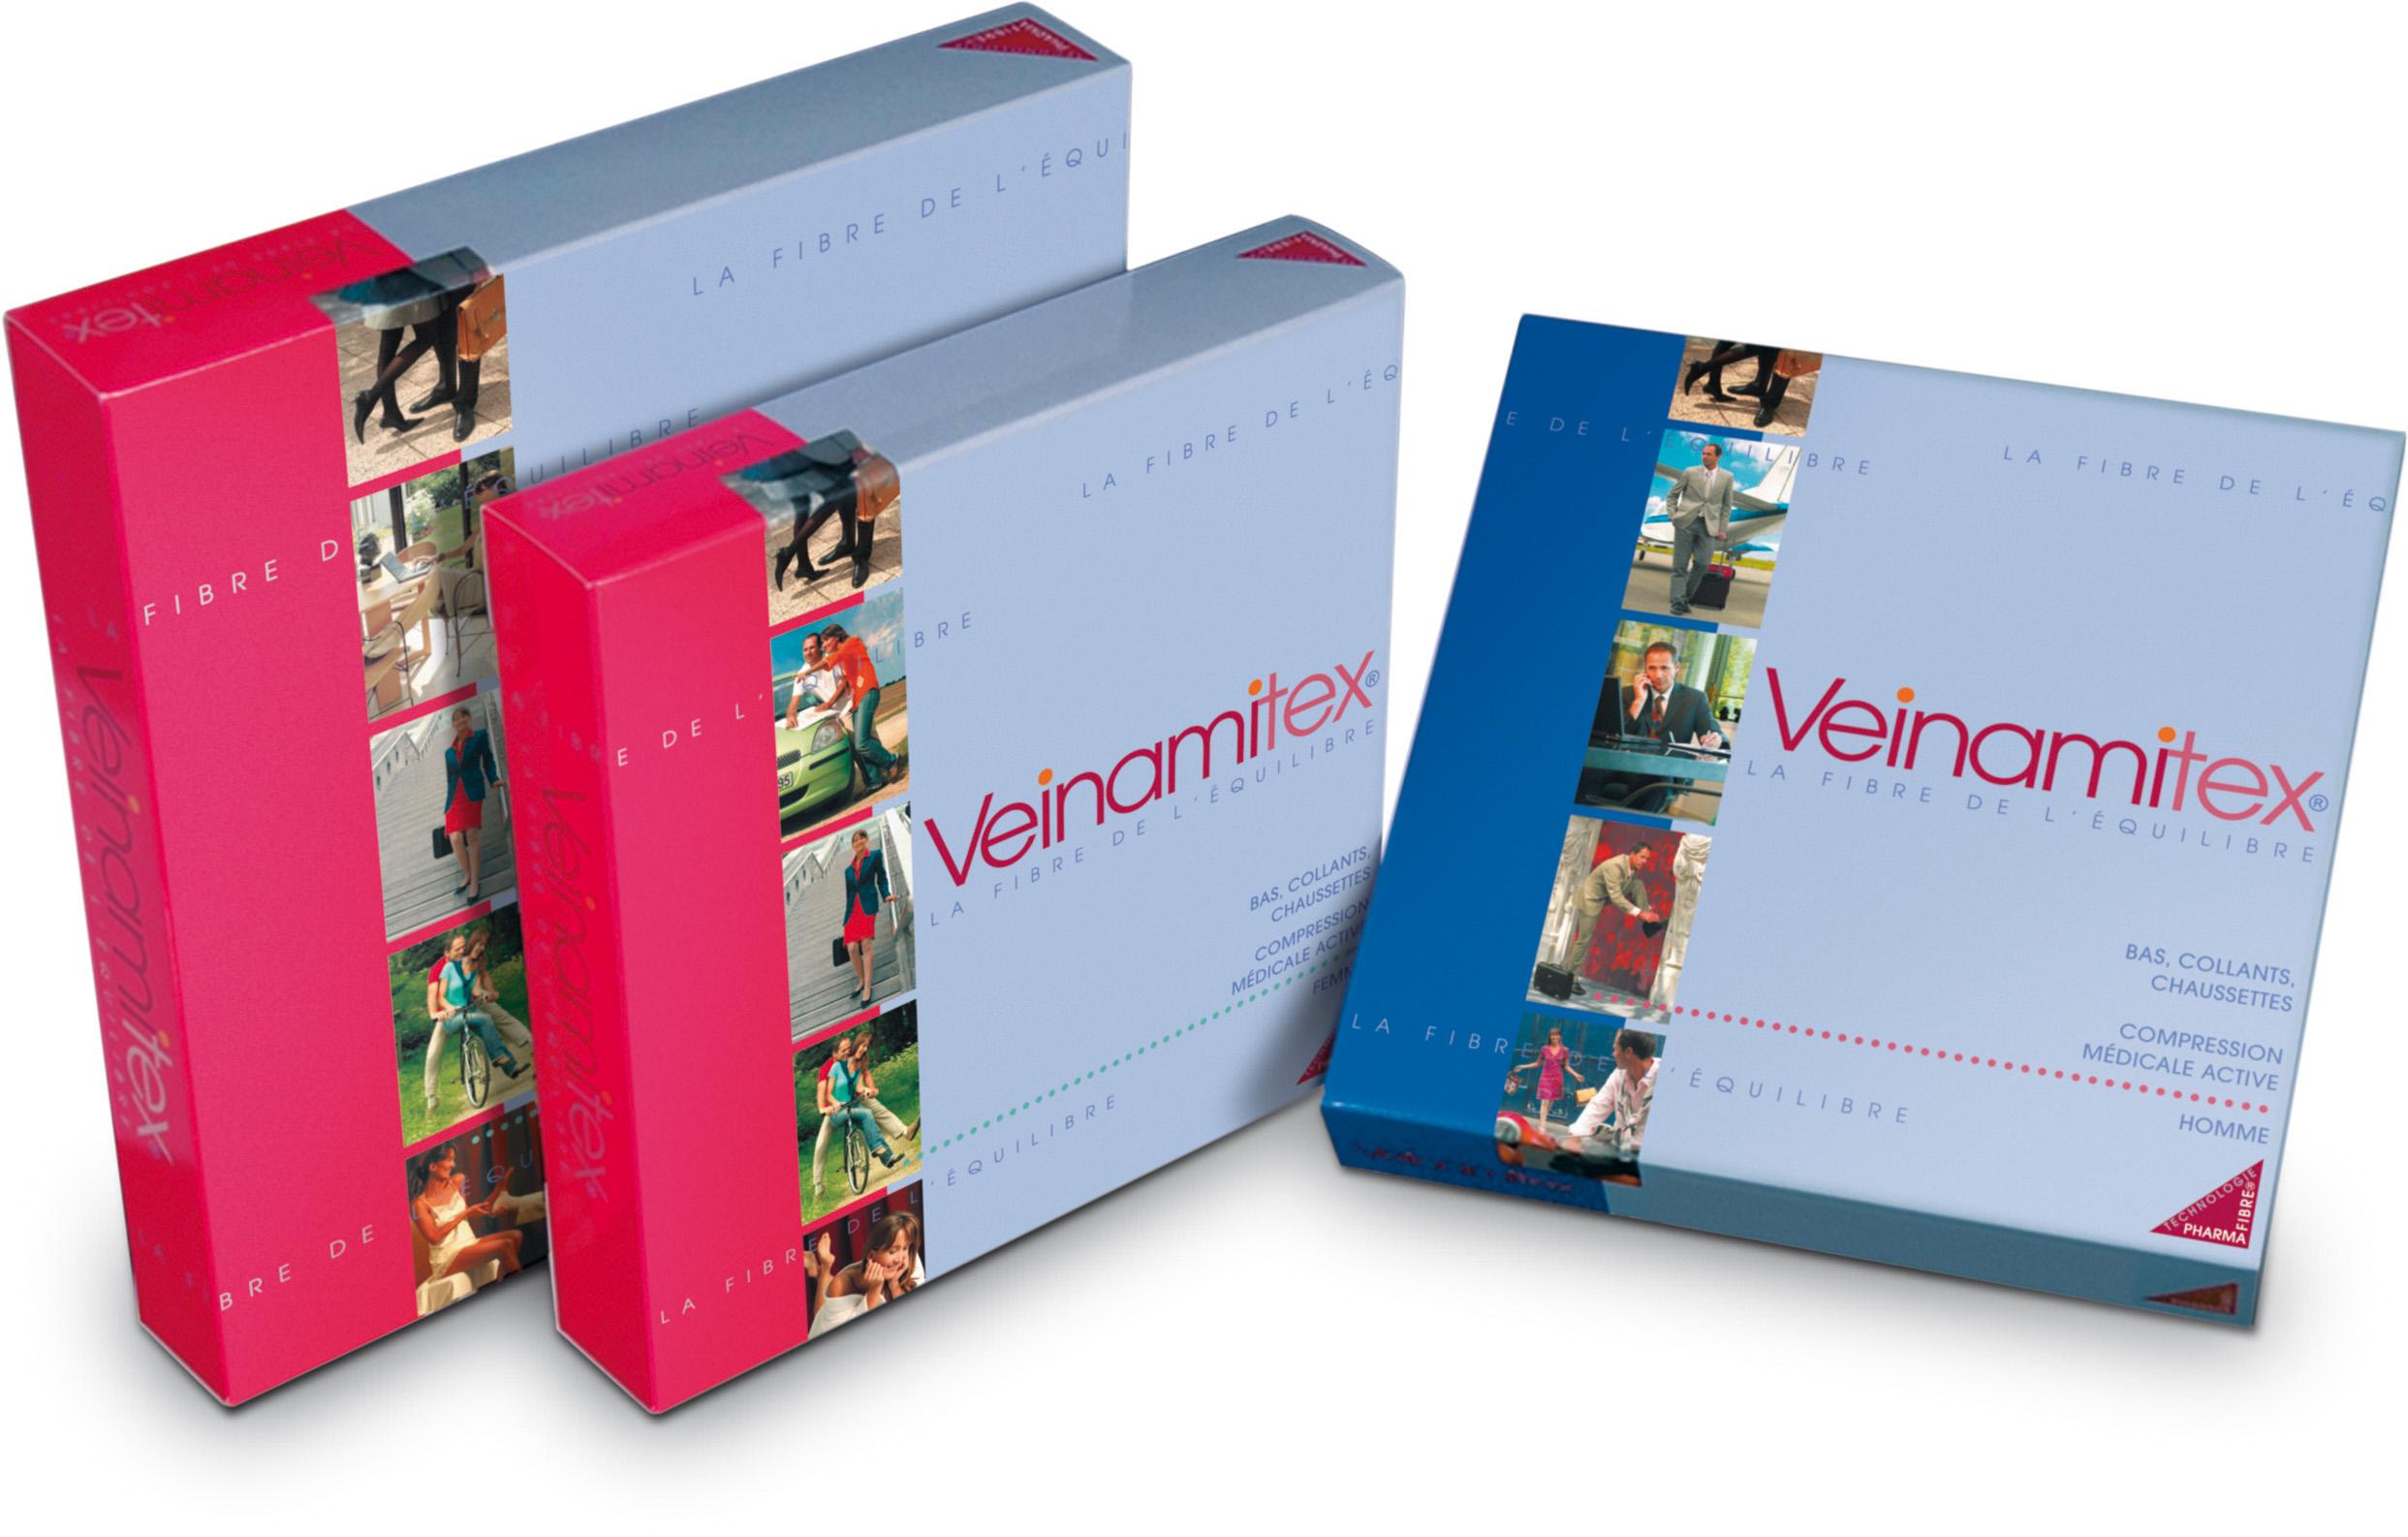 Image VEINAMITEX 2 chaussette opaque